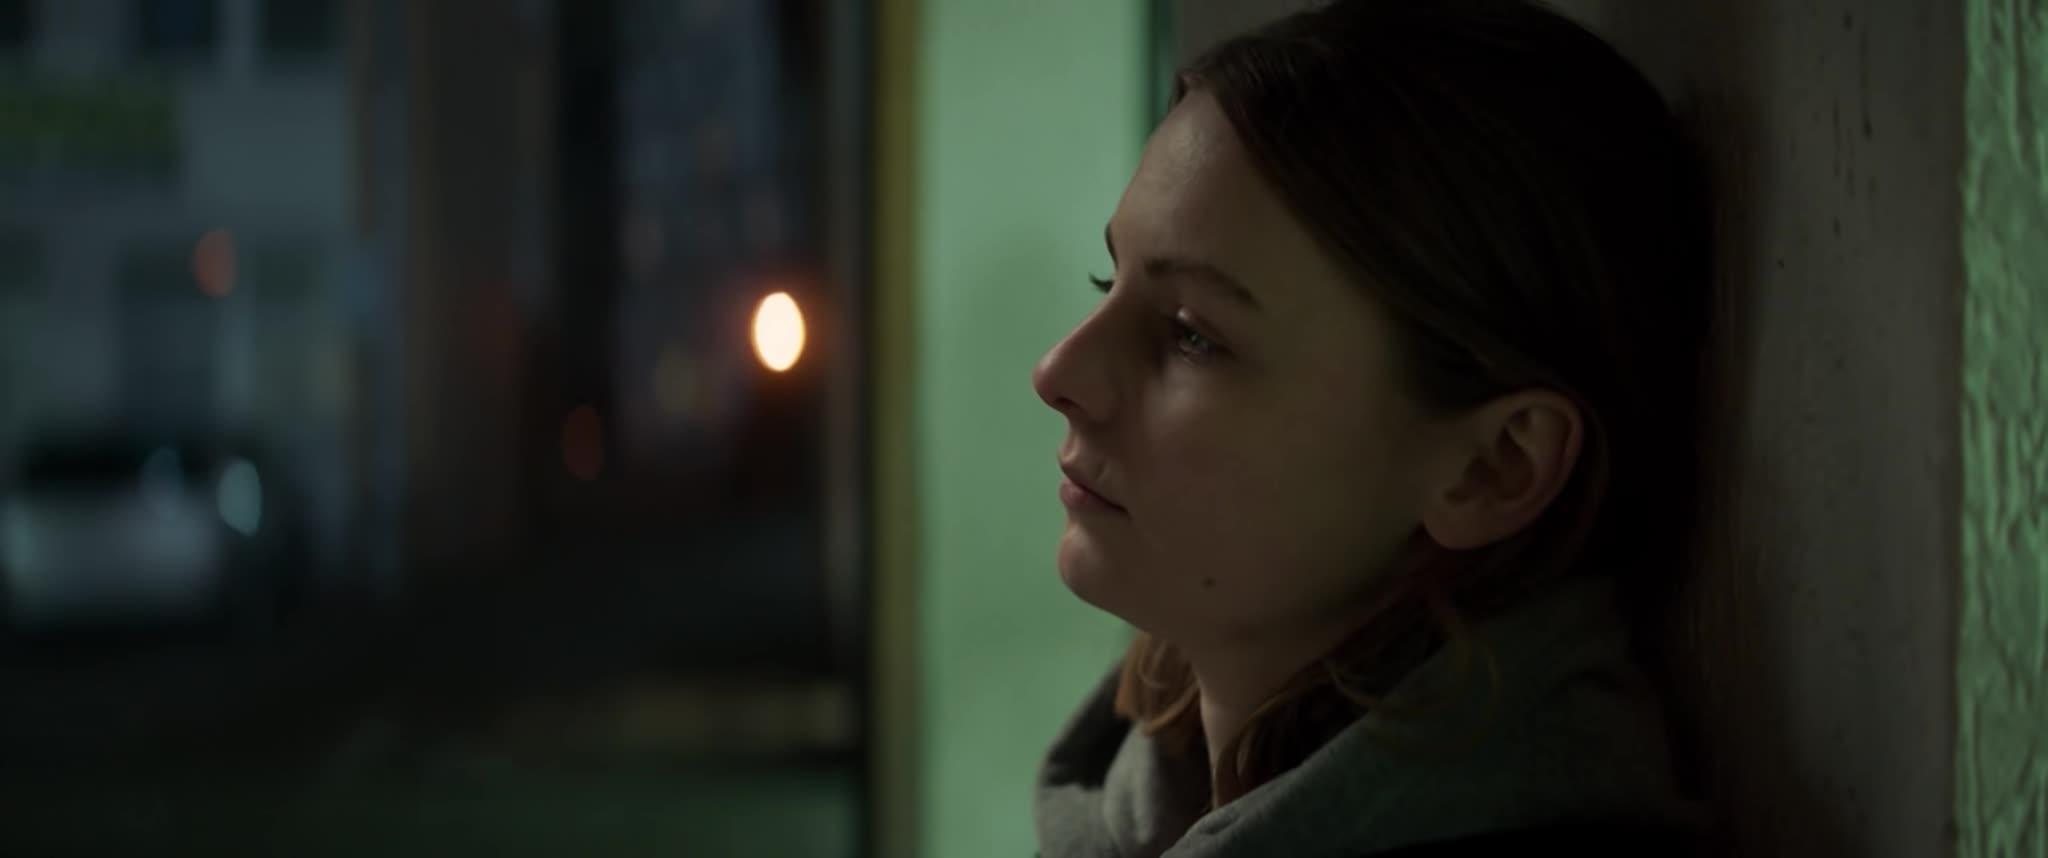 Jak najdalej stad film-i-never-cry-2020-movie